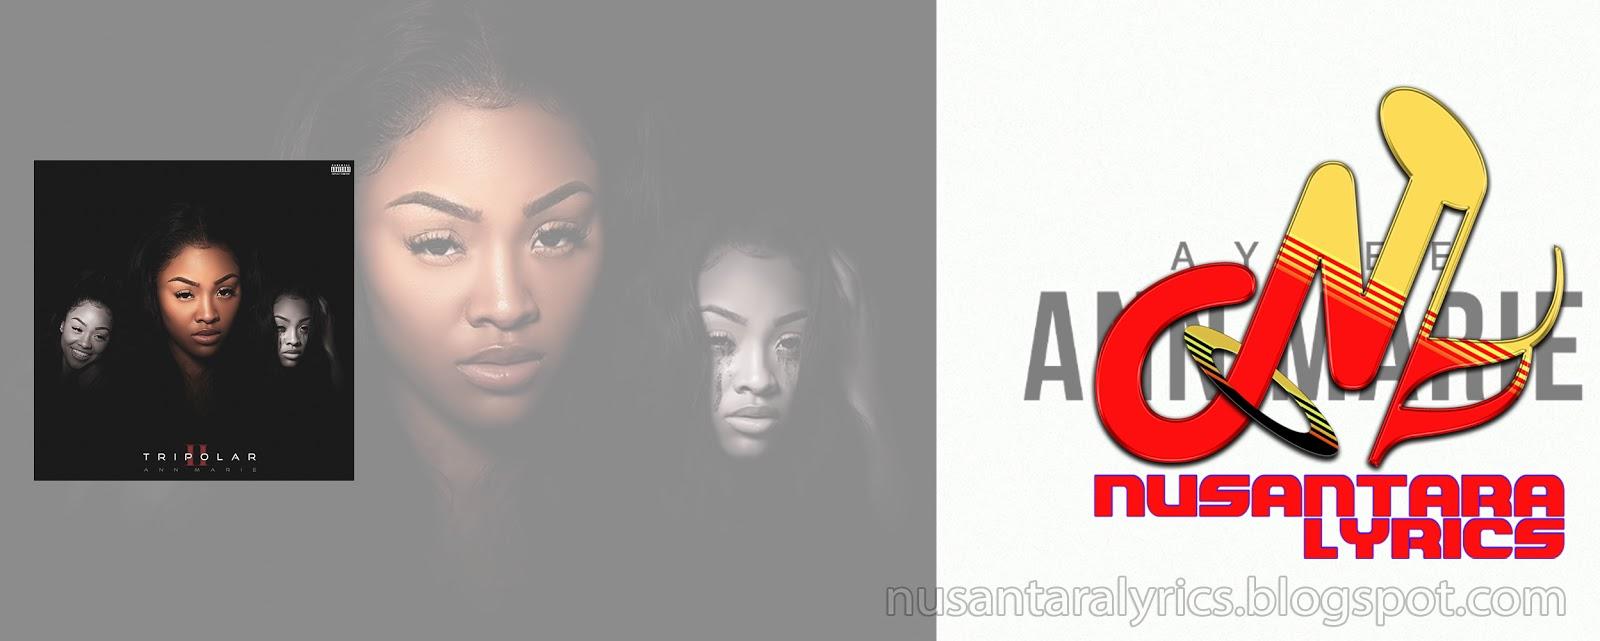 Ann Marie - Ayeee - Nusantara Lyrics